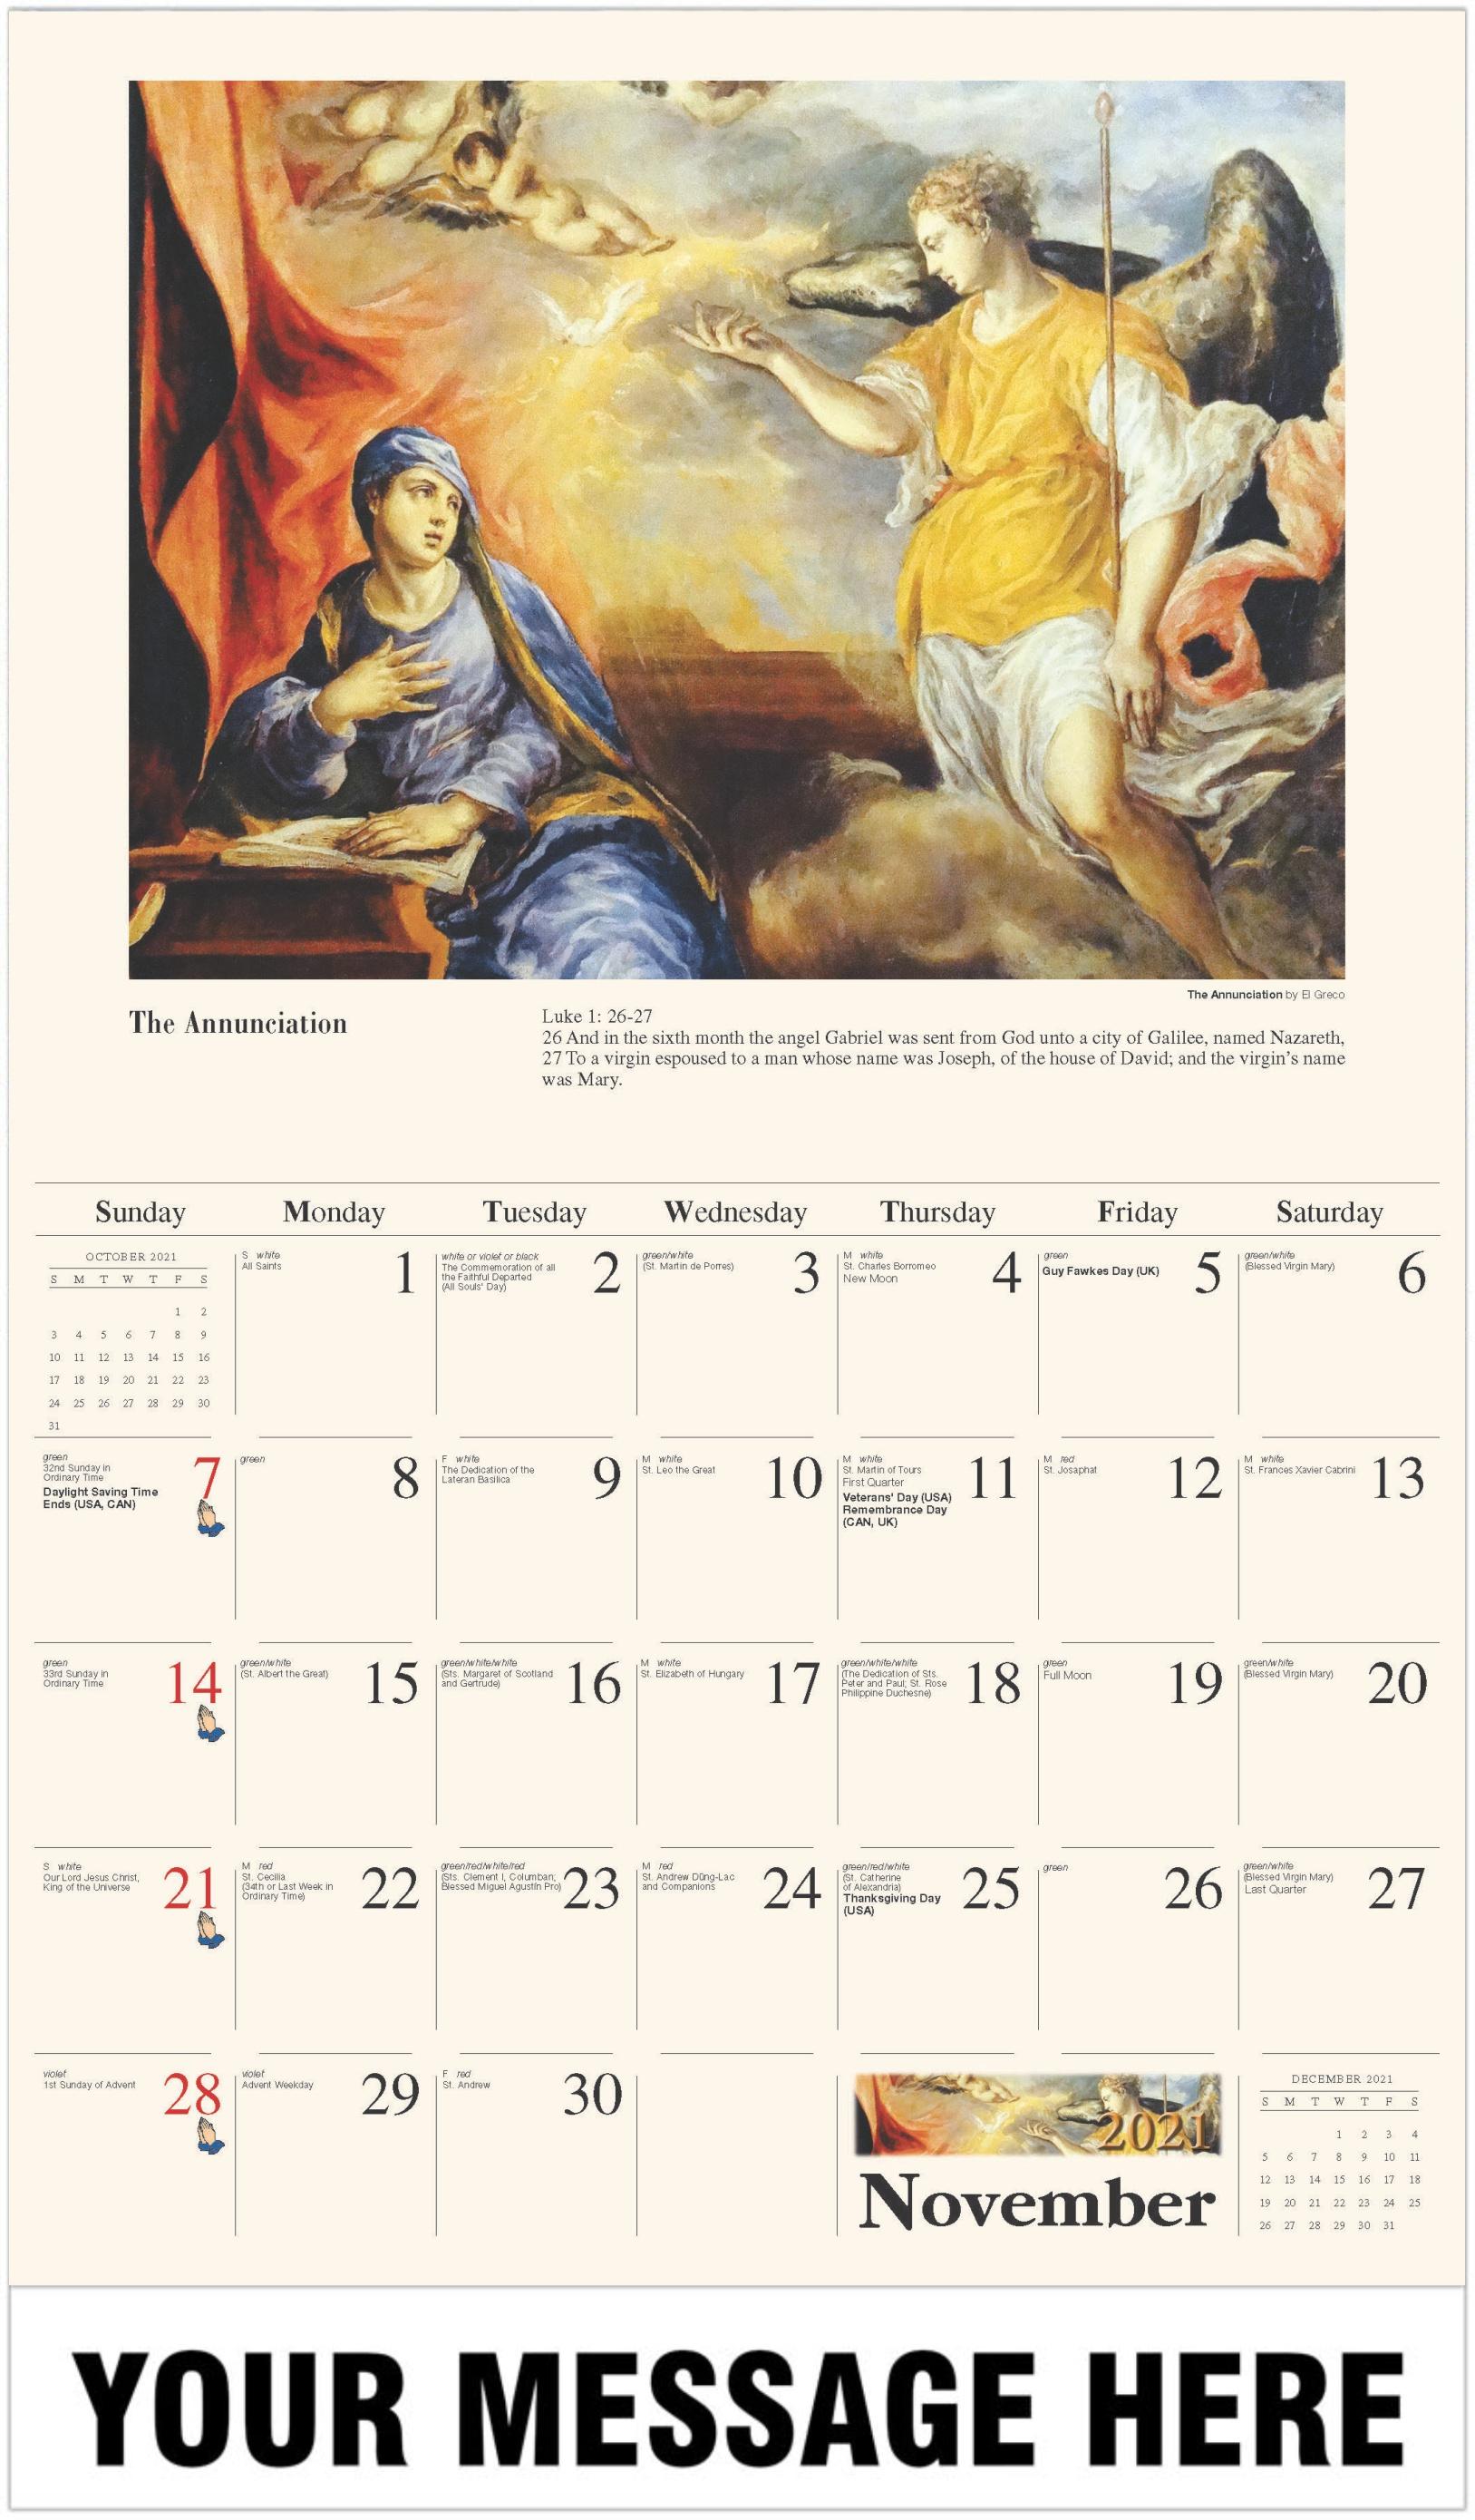 Catholic Wall Calendar 2021 Catholic Art 2021 Promotional Calendar   Fundraising and Business